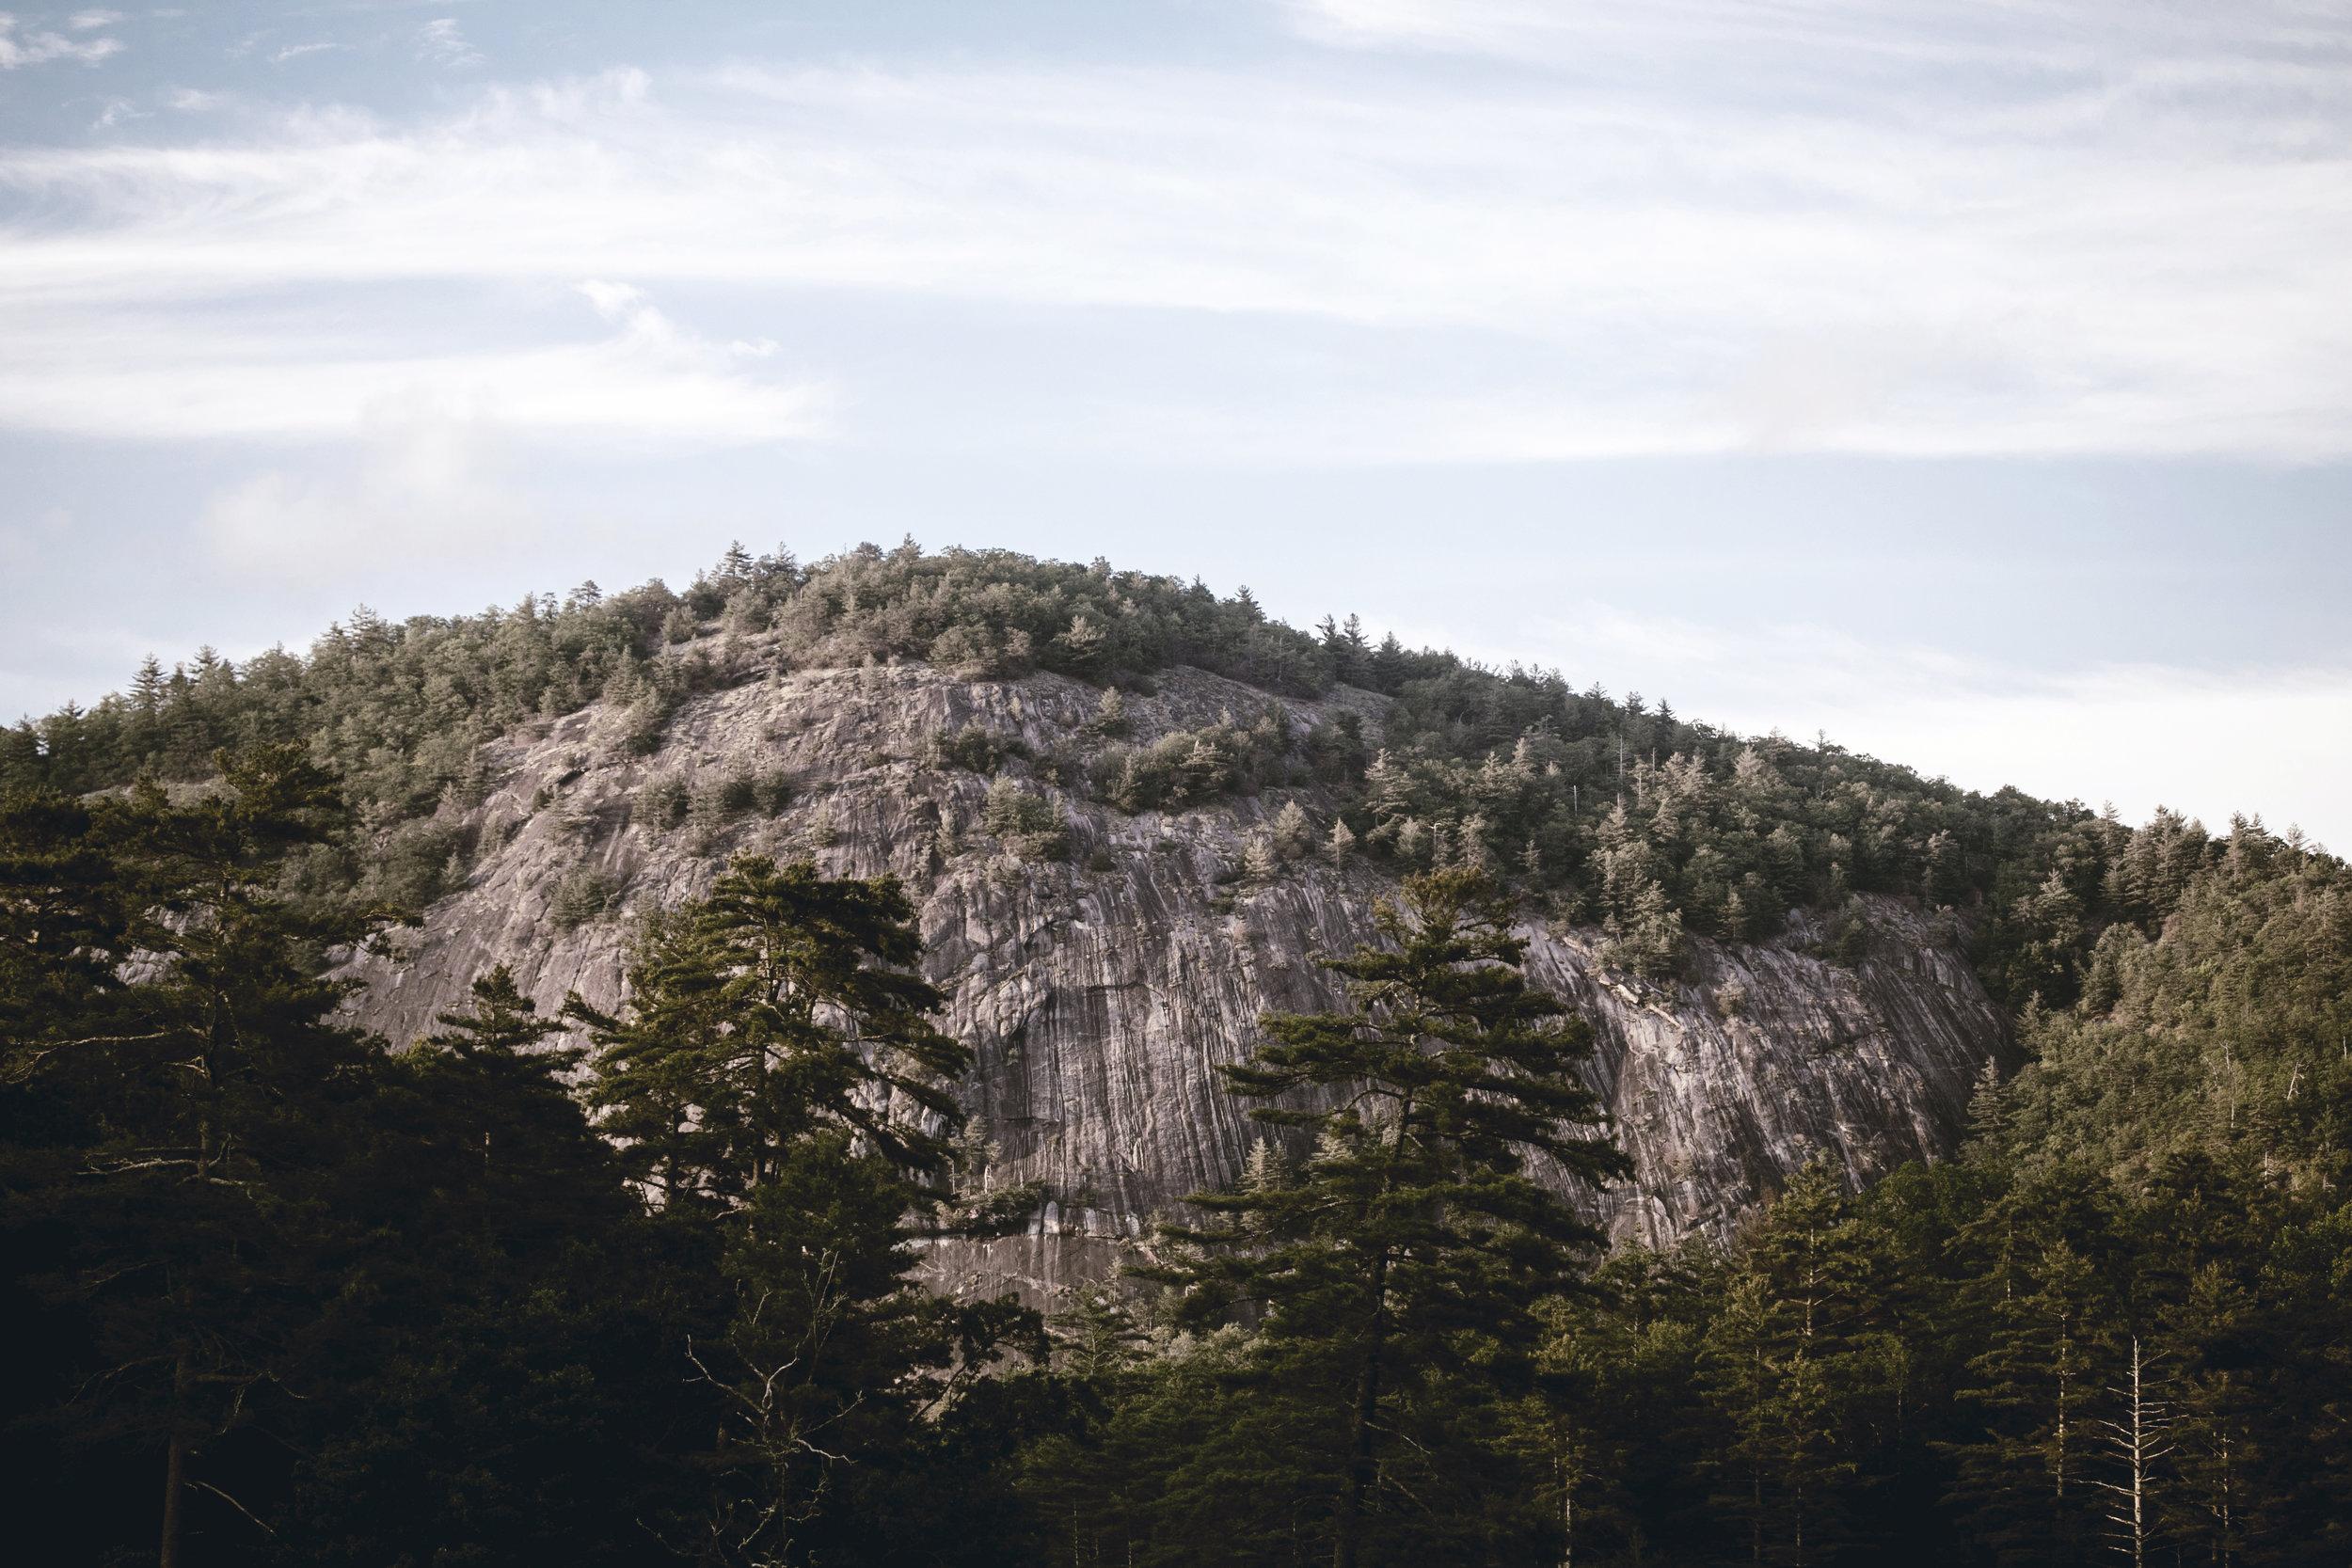 bald mountain in cashiers North Carolina / heirloomed